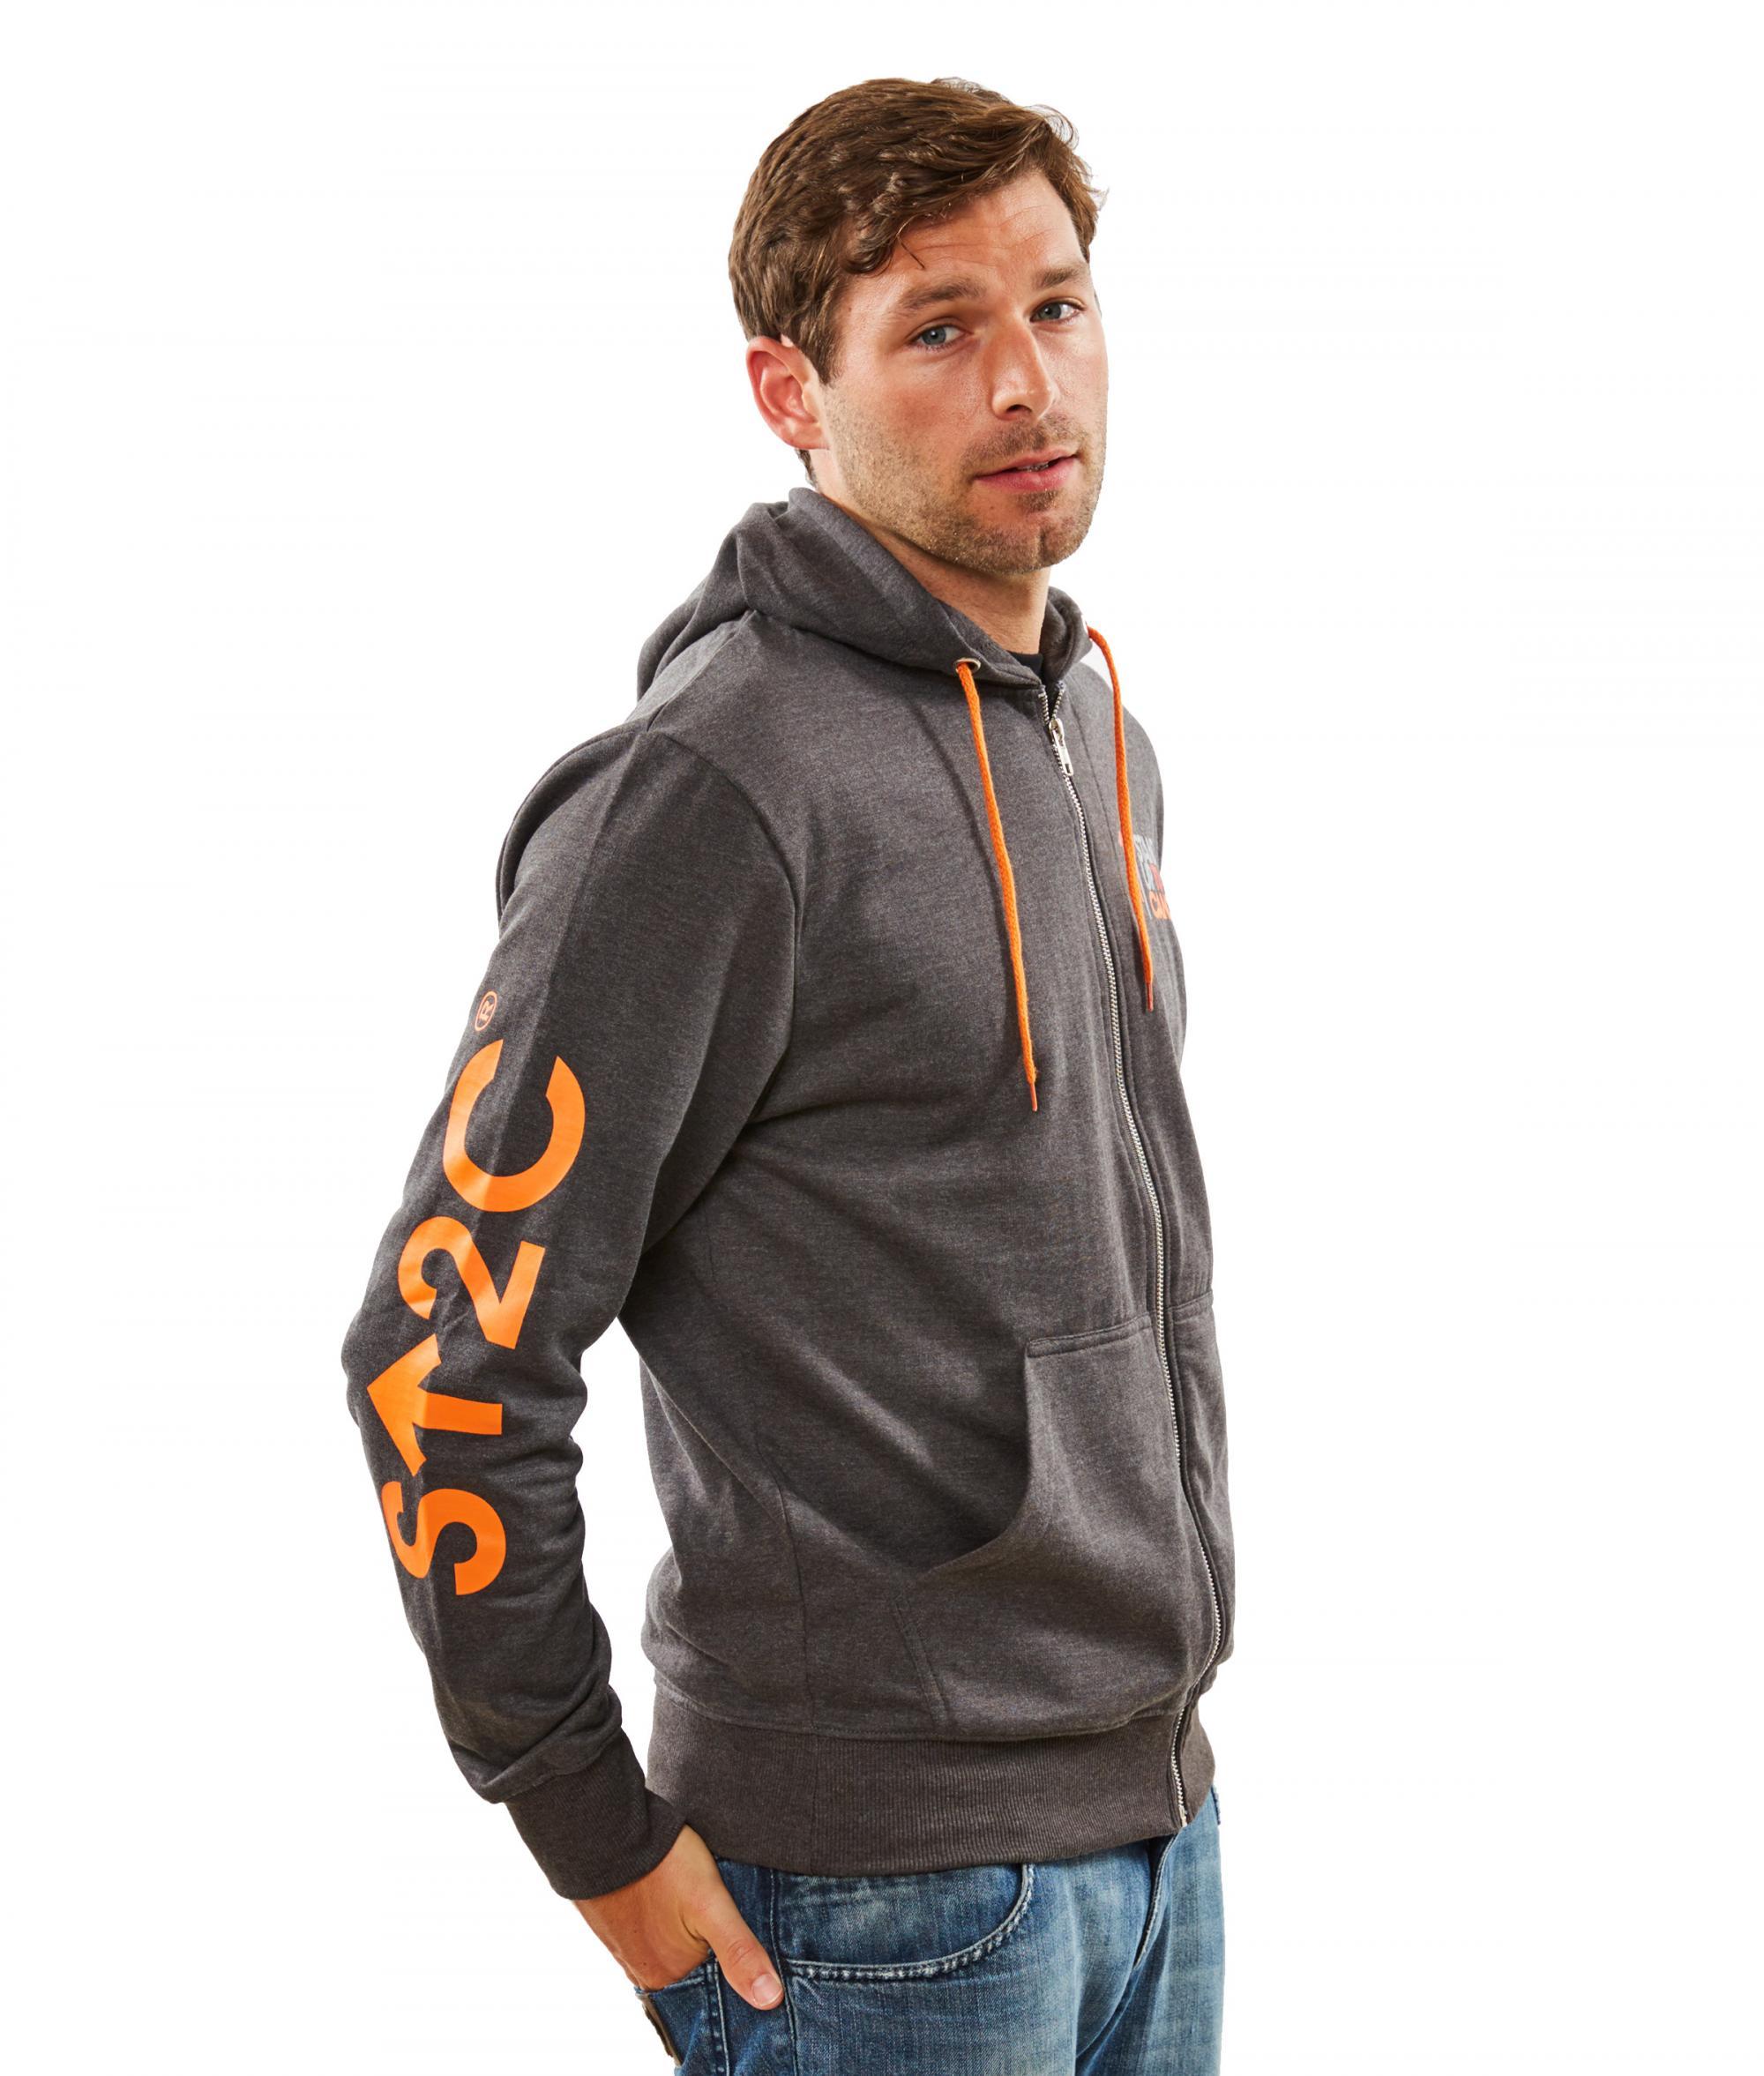 Stand Cancer Men' Grey Hoodie With Orange Trim